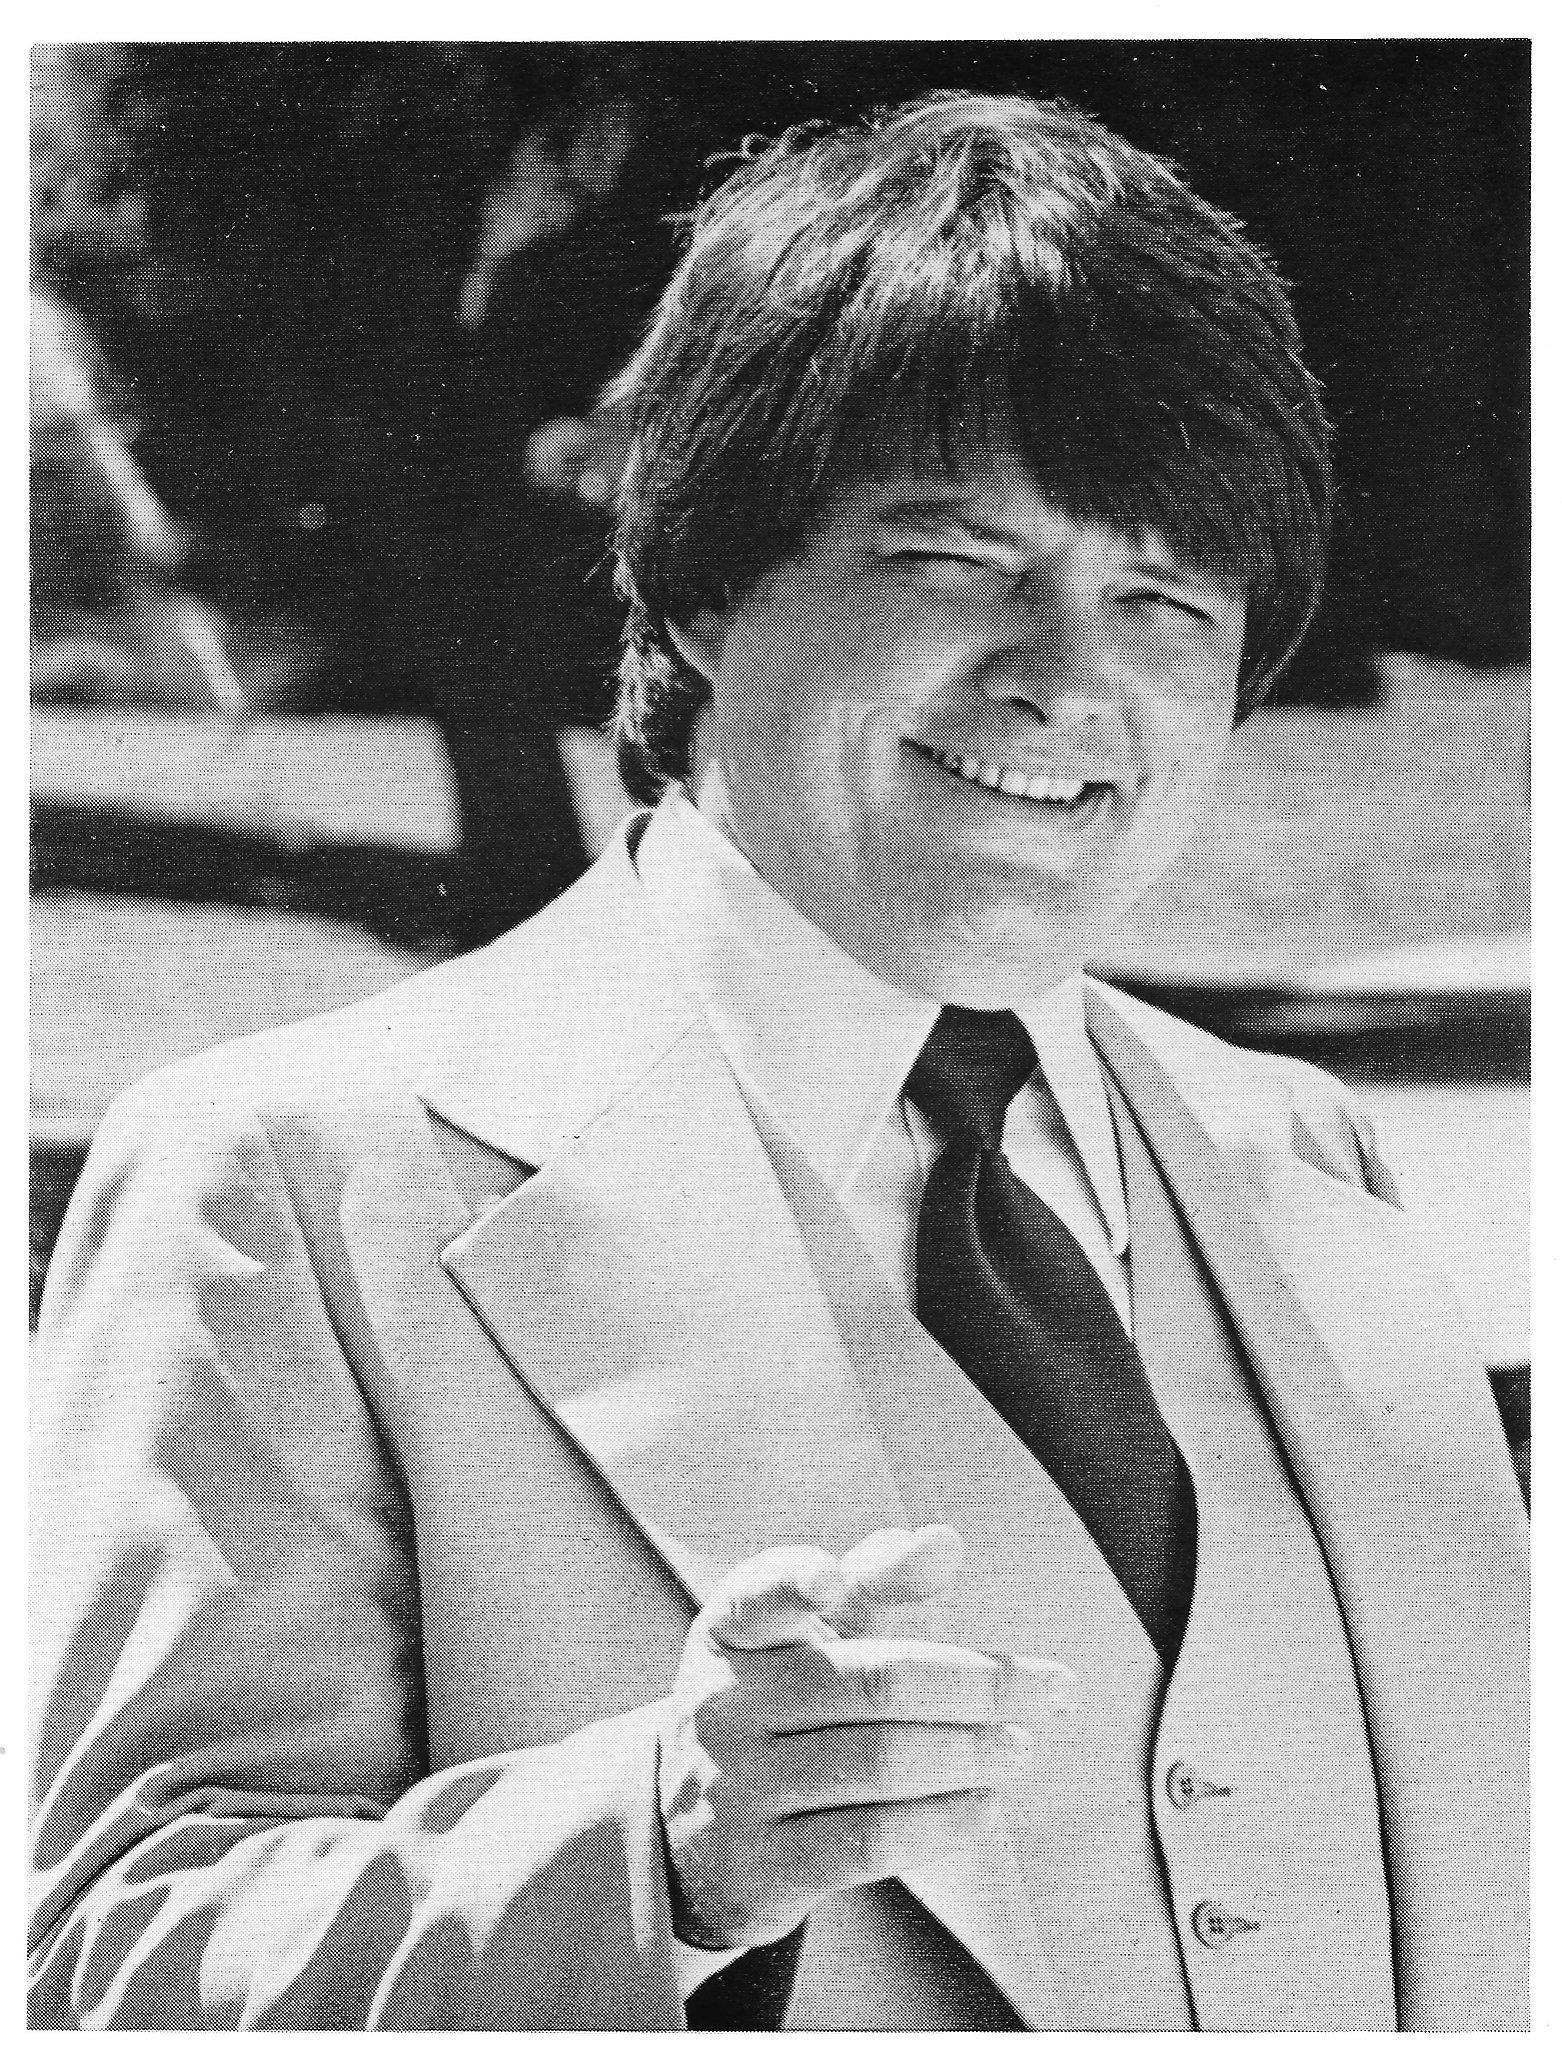 John Mack Flanagan, 1970s Top 40 disc jockey at KFRC, dies - San ...